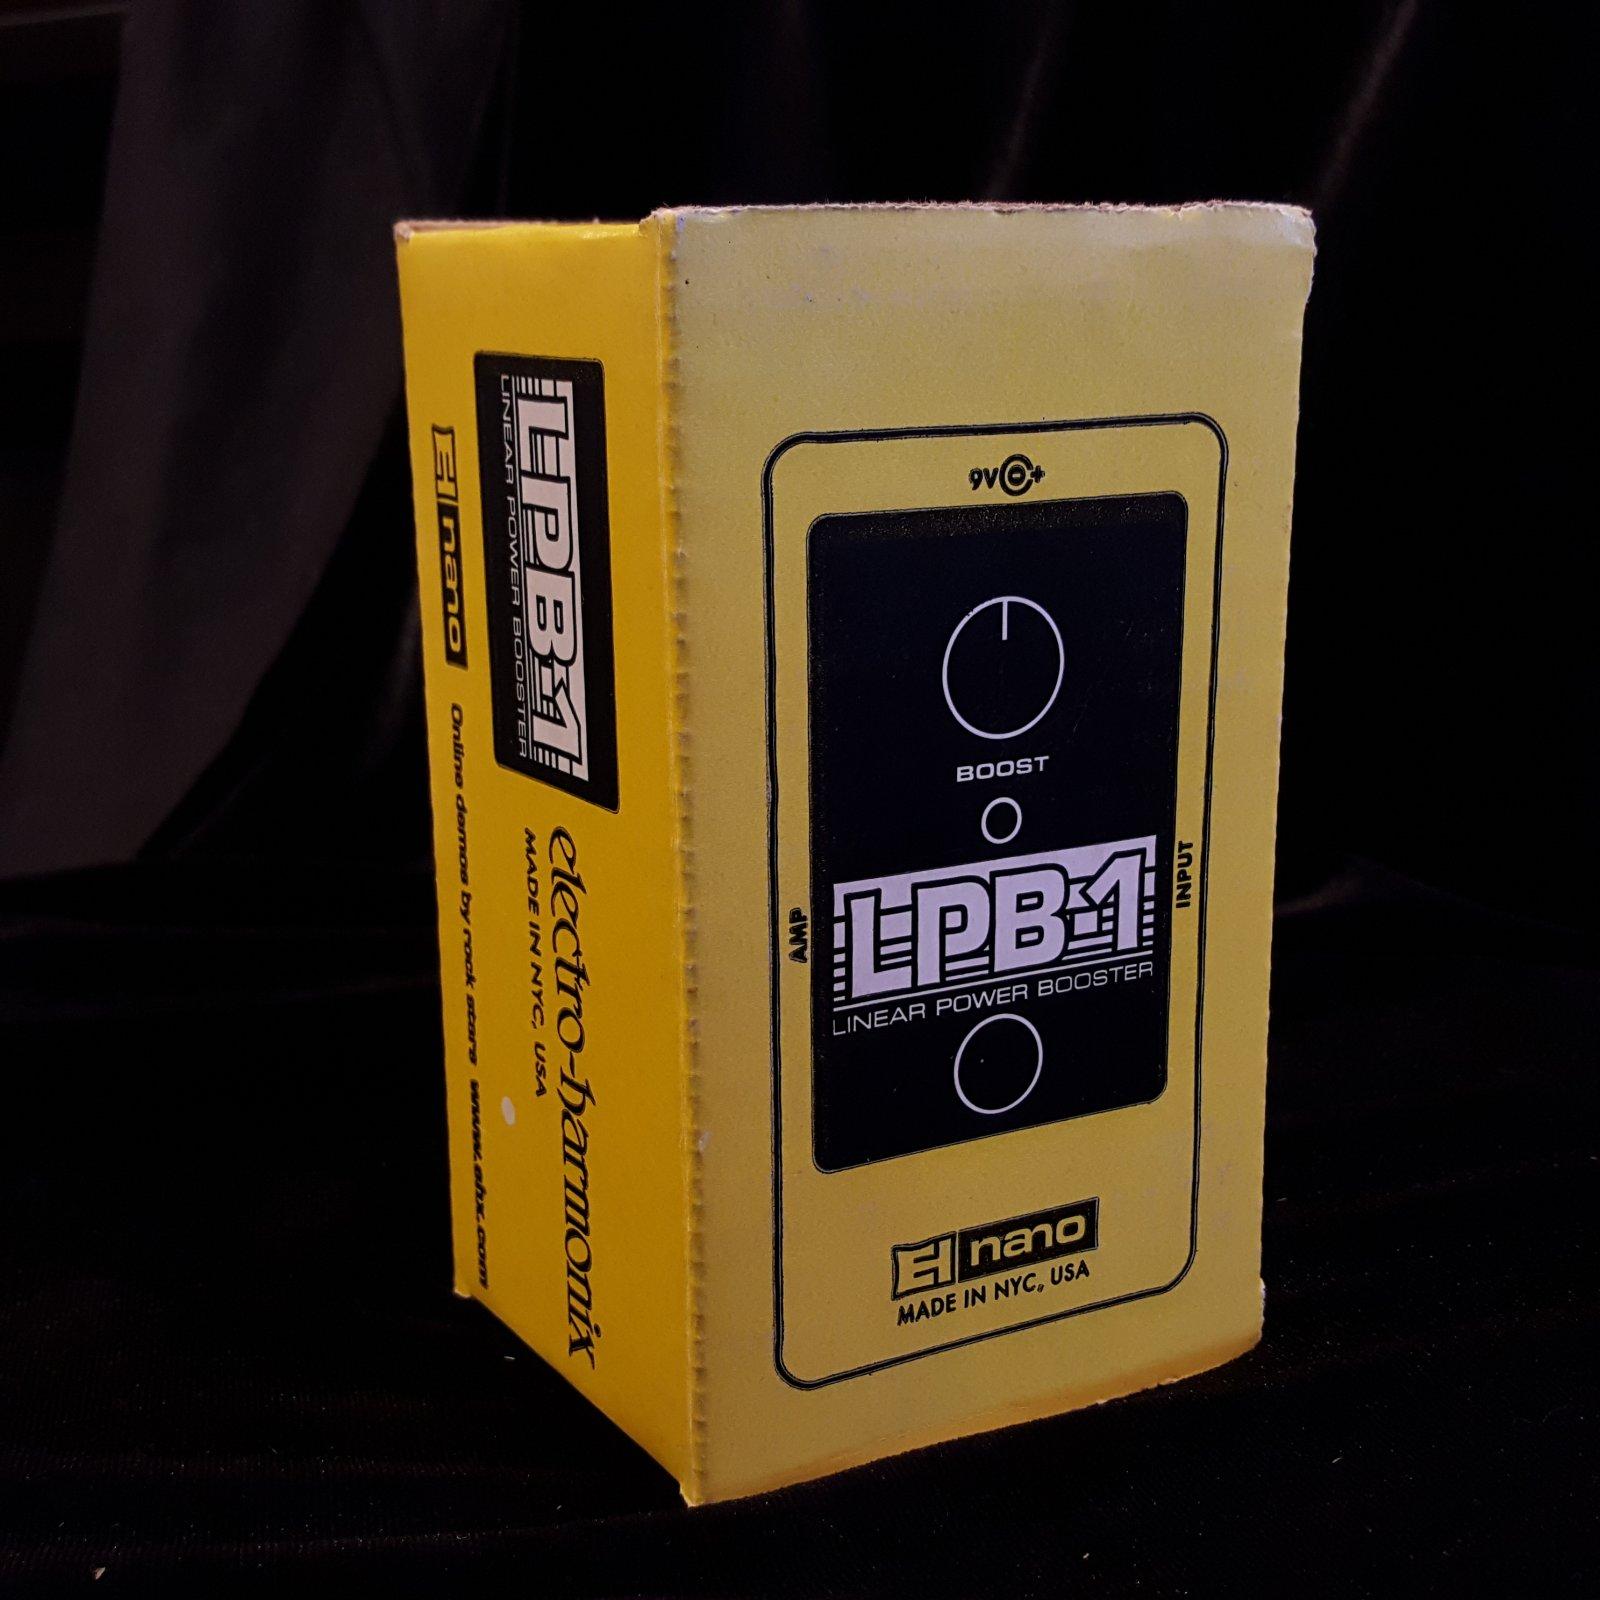 Electro Harmonix El Nano LBP-1 Linear Power Booster